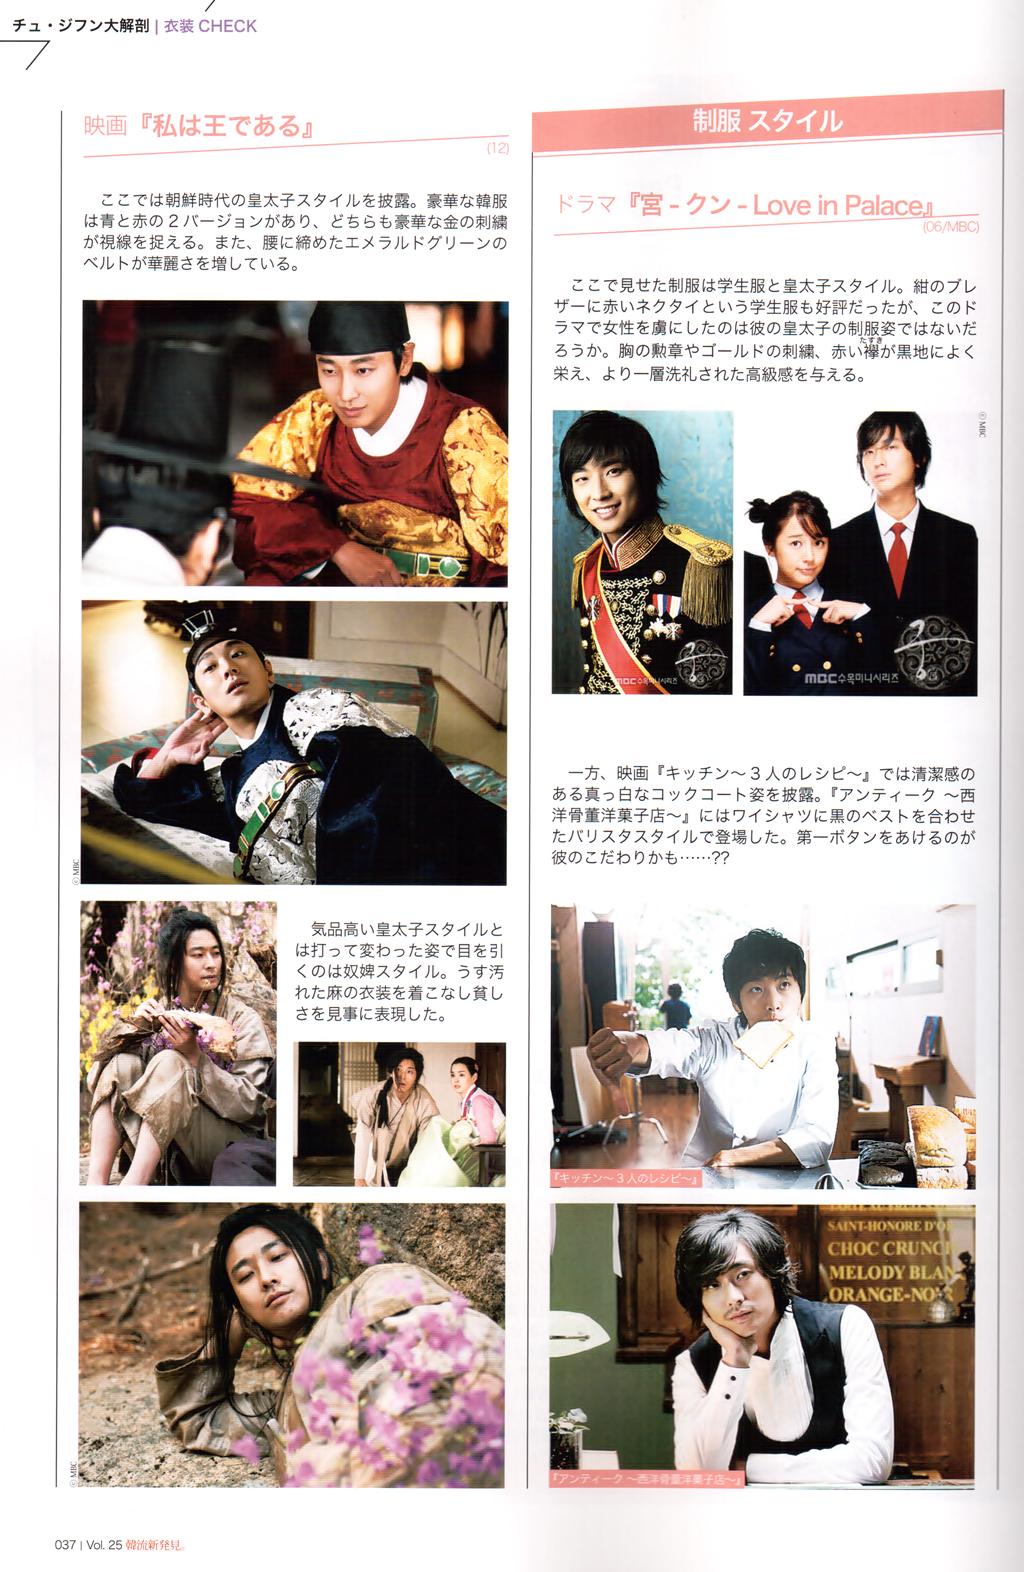 KEJ PART 4 衣裝CHECK (3)